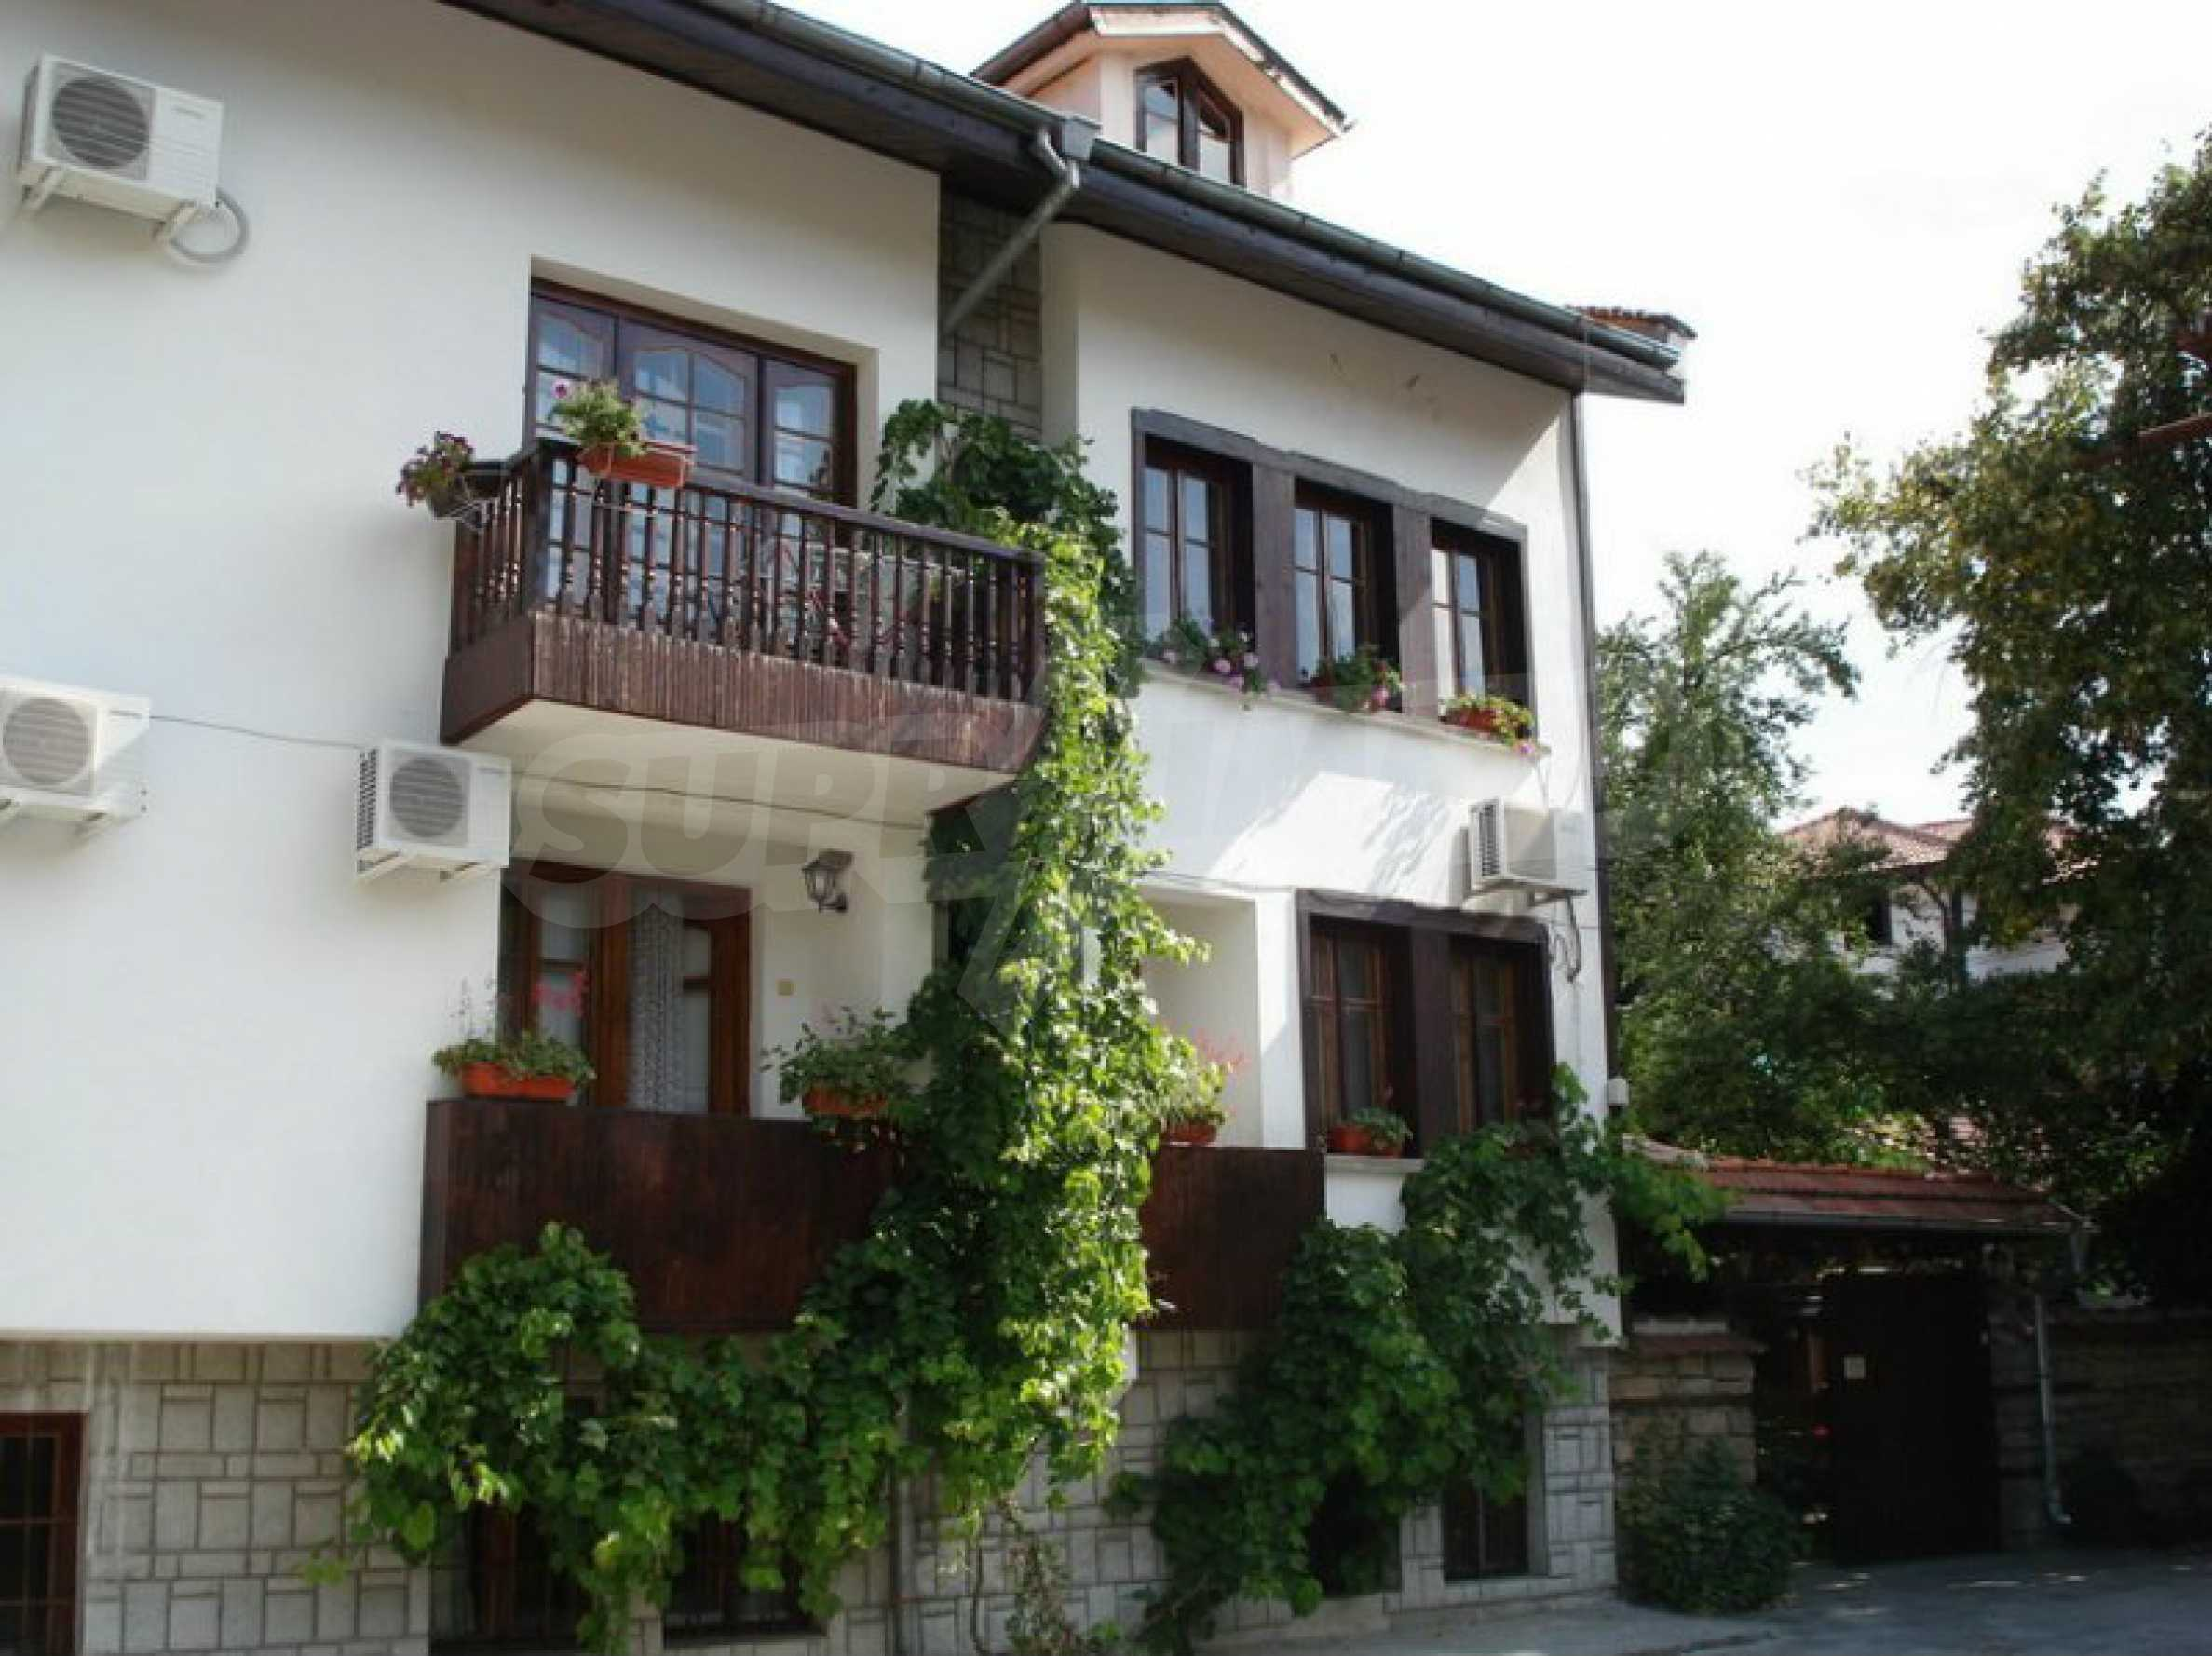 Hotelanlage mit Restaurant am Ufer des Flusses Osam in Lovech 19